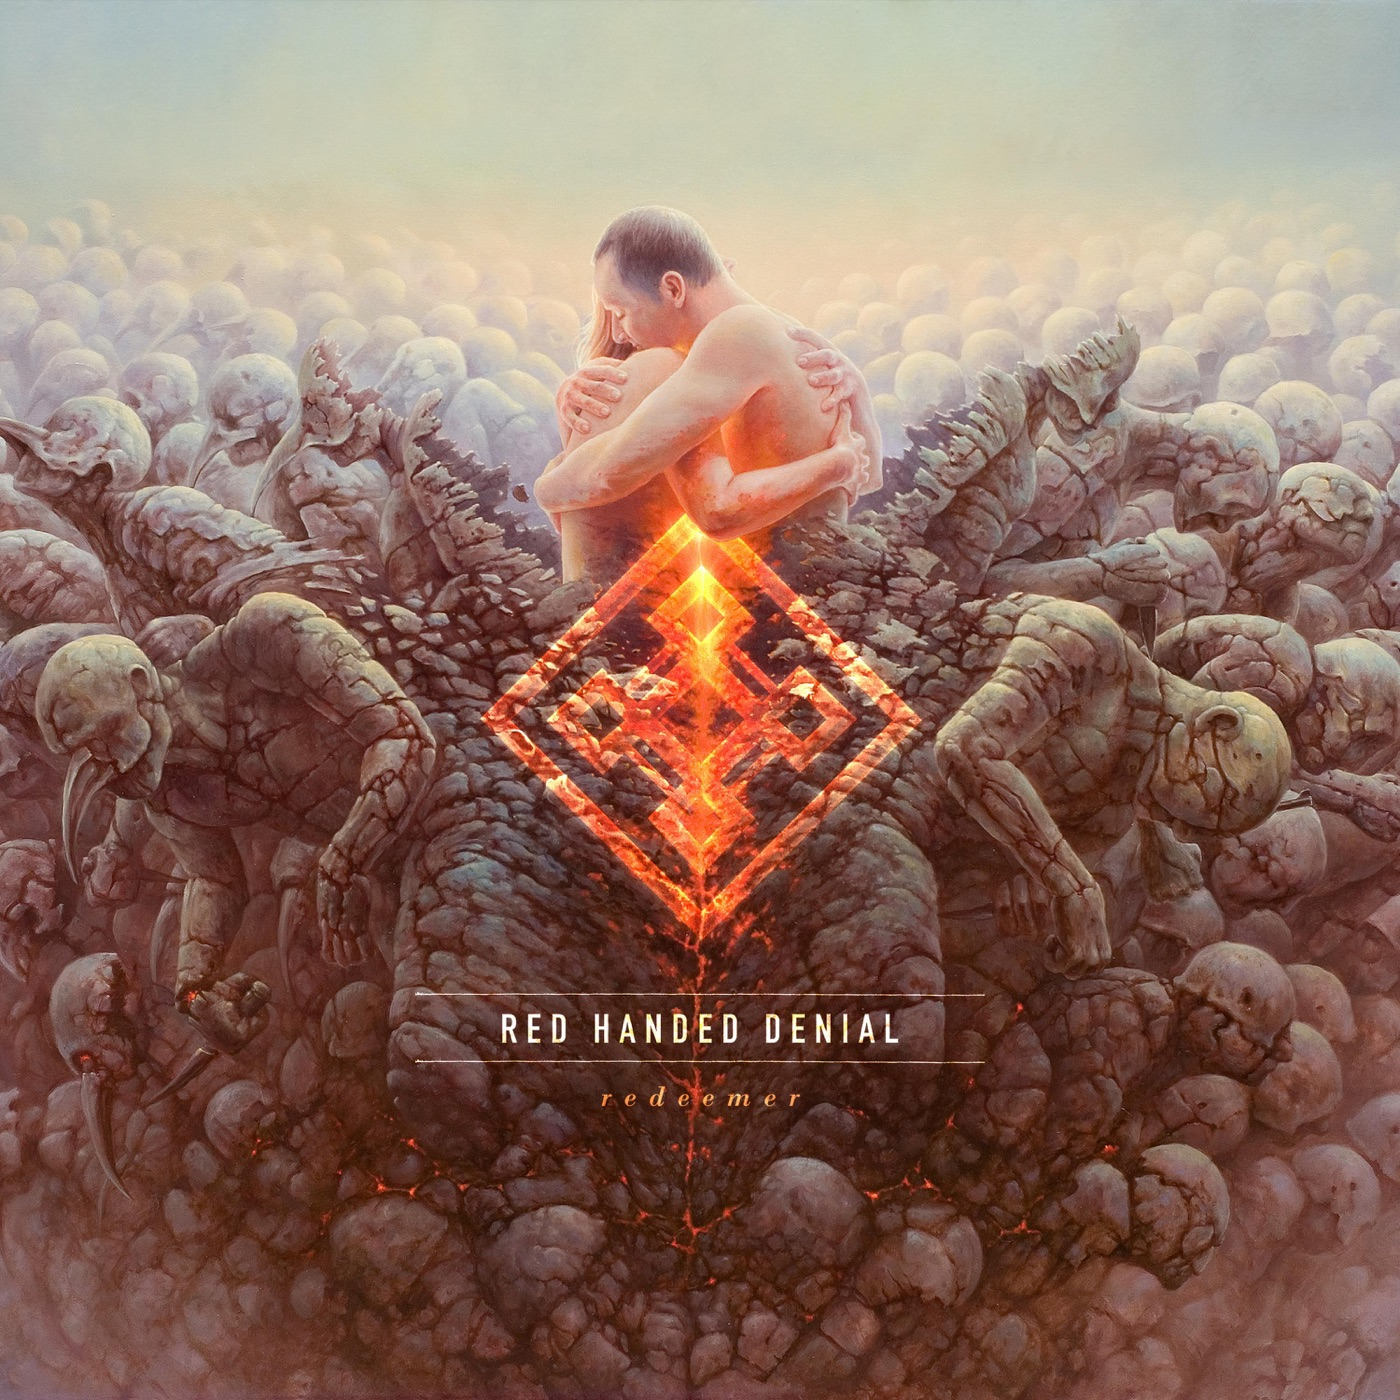 Red Handed Denial - Empire [single] (2019)